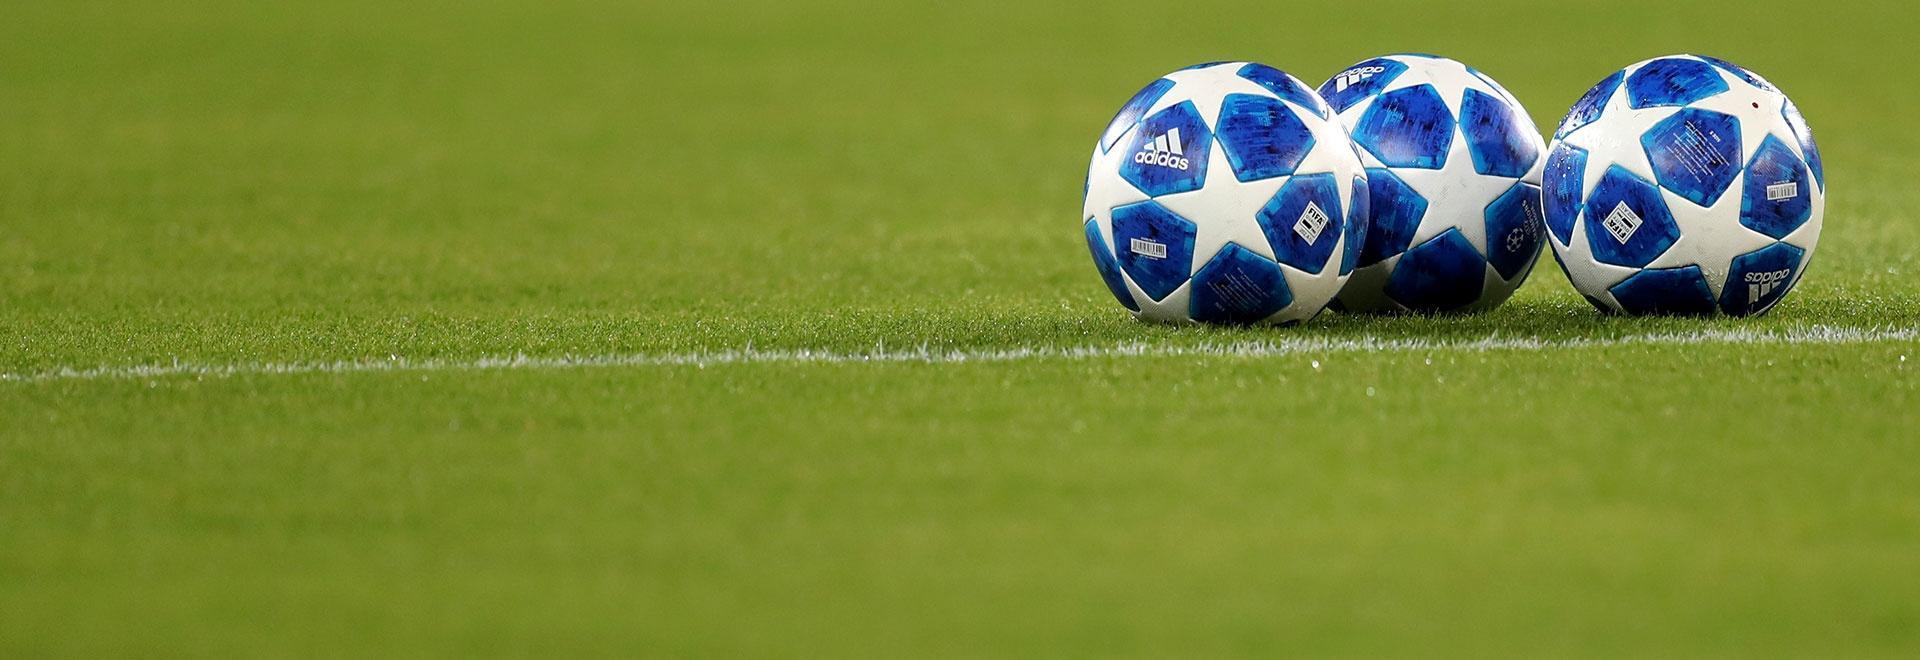 Bayern Monaco - Inter 2010